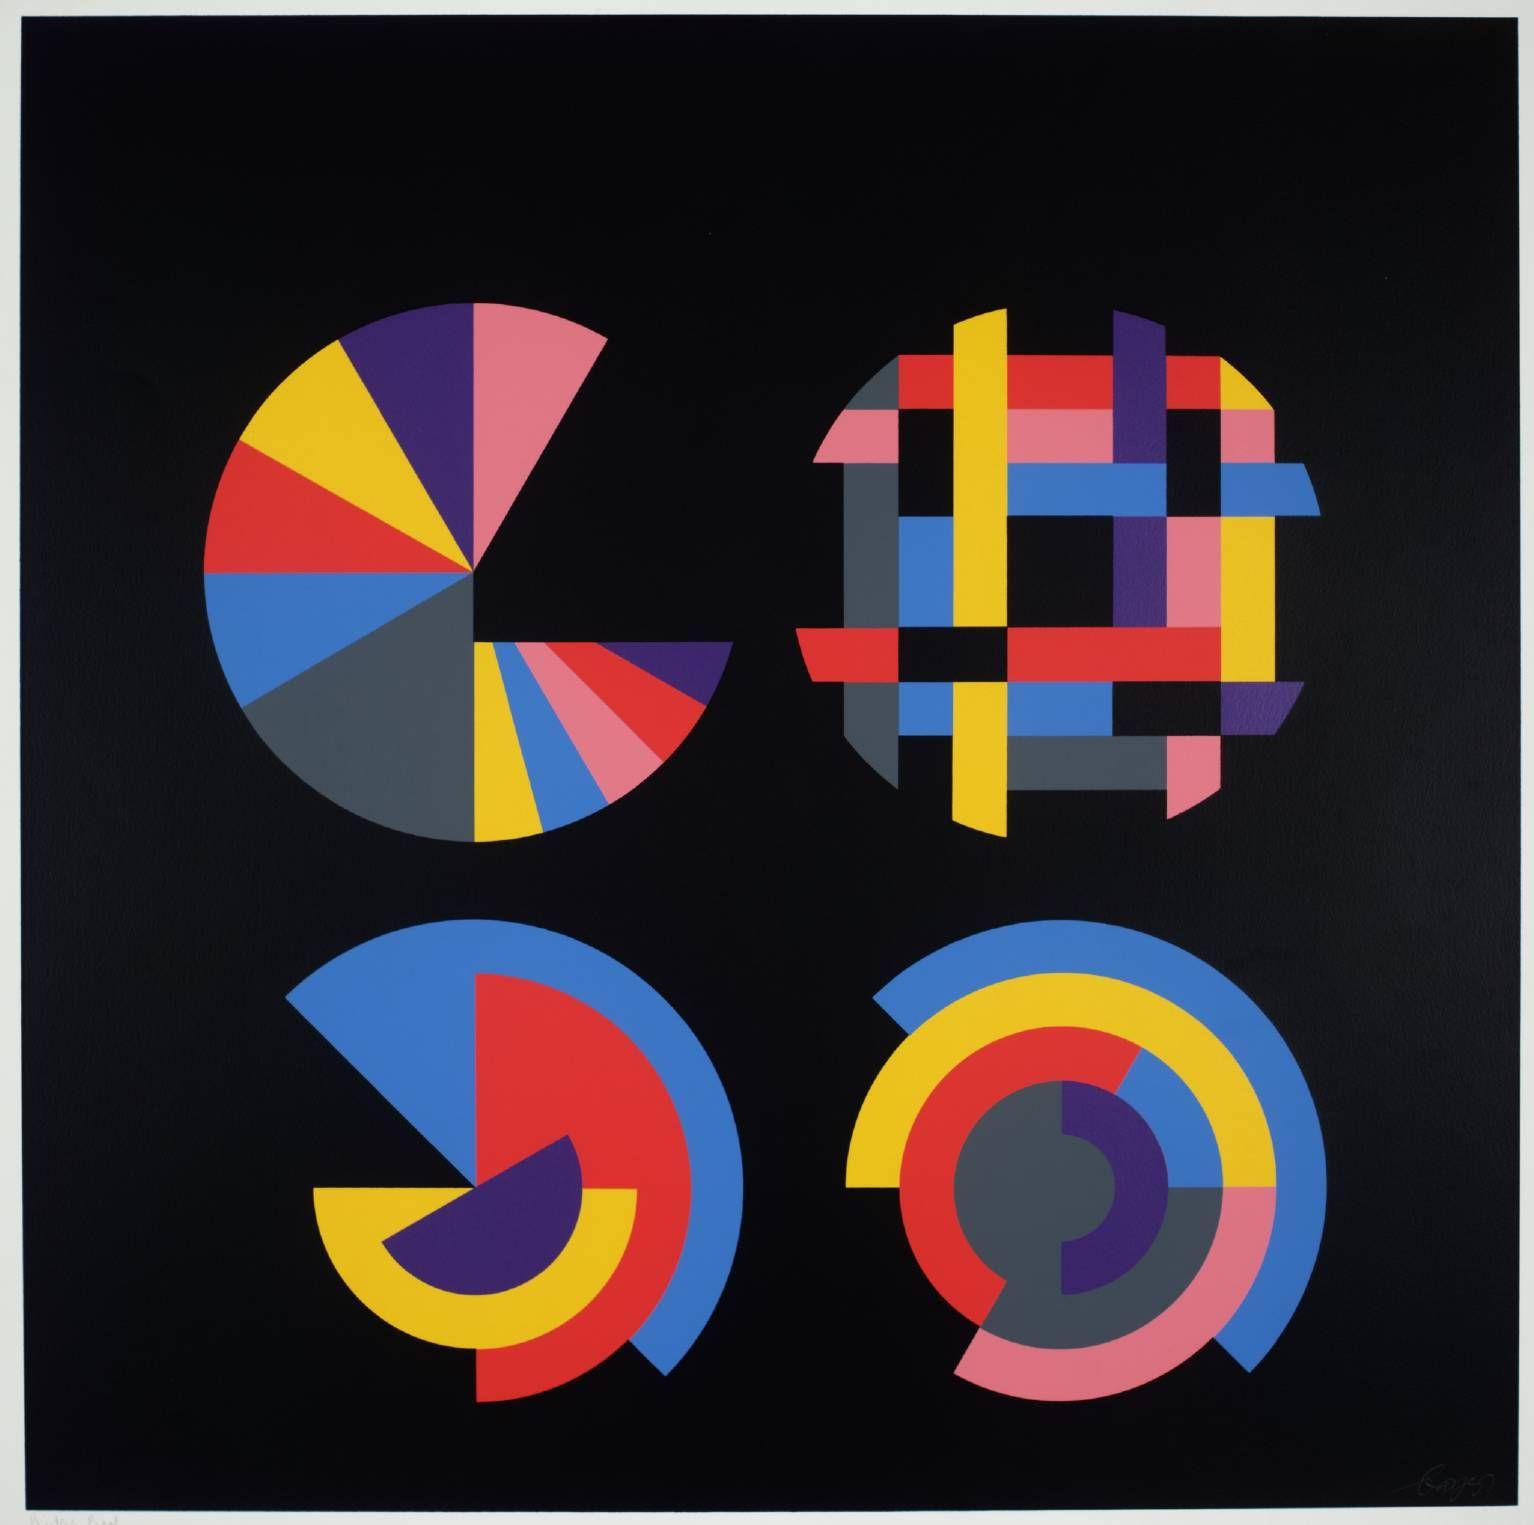 Herbert Bayer, 'Four Segmented Circles' 1970